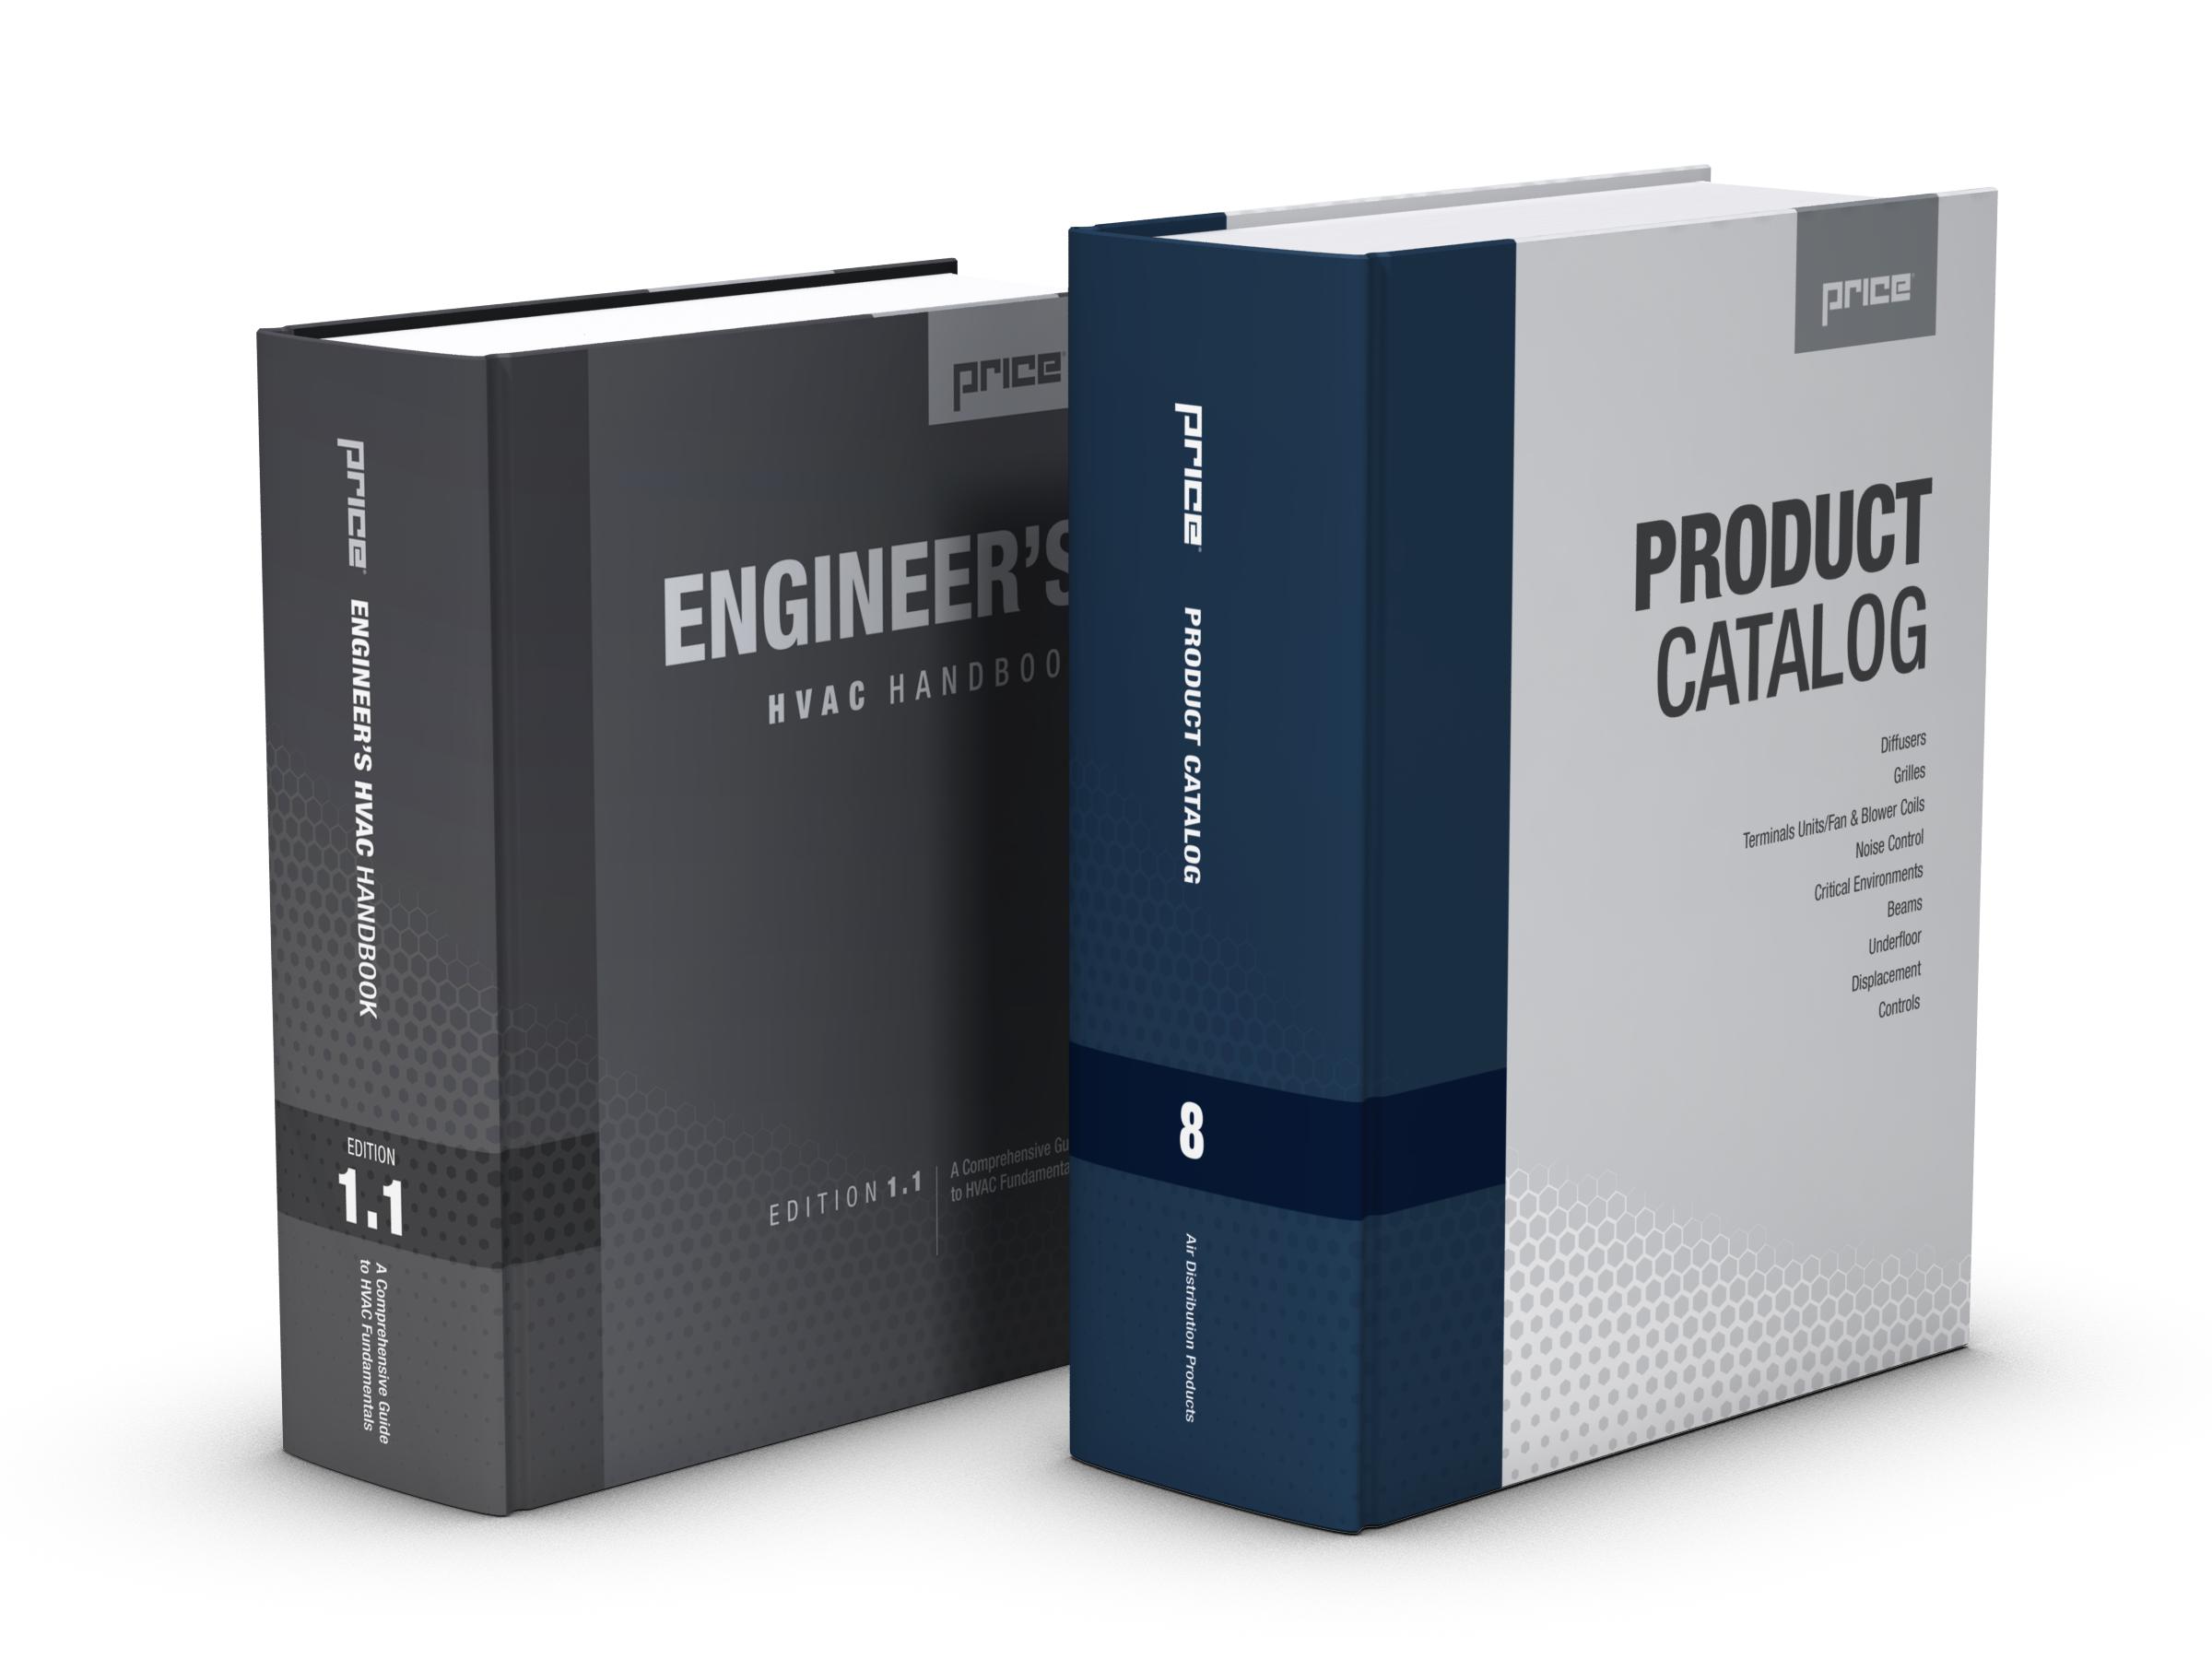 Price Product Catalog 8 + Price Enginee'rs HVAC Handbook